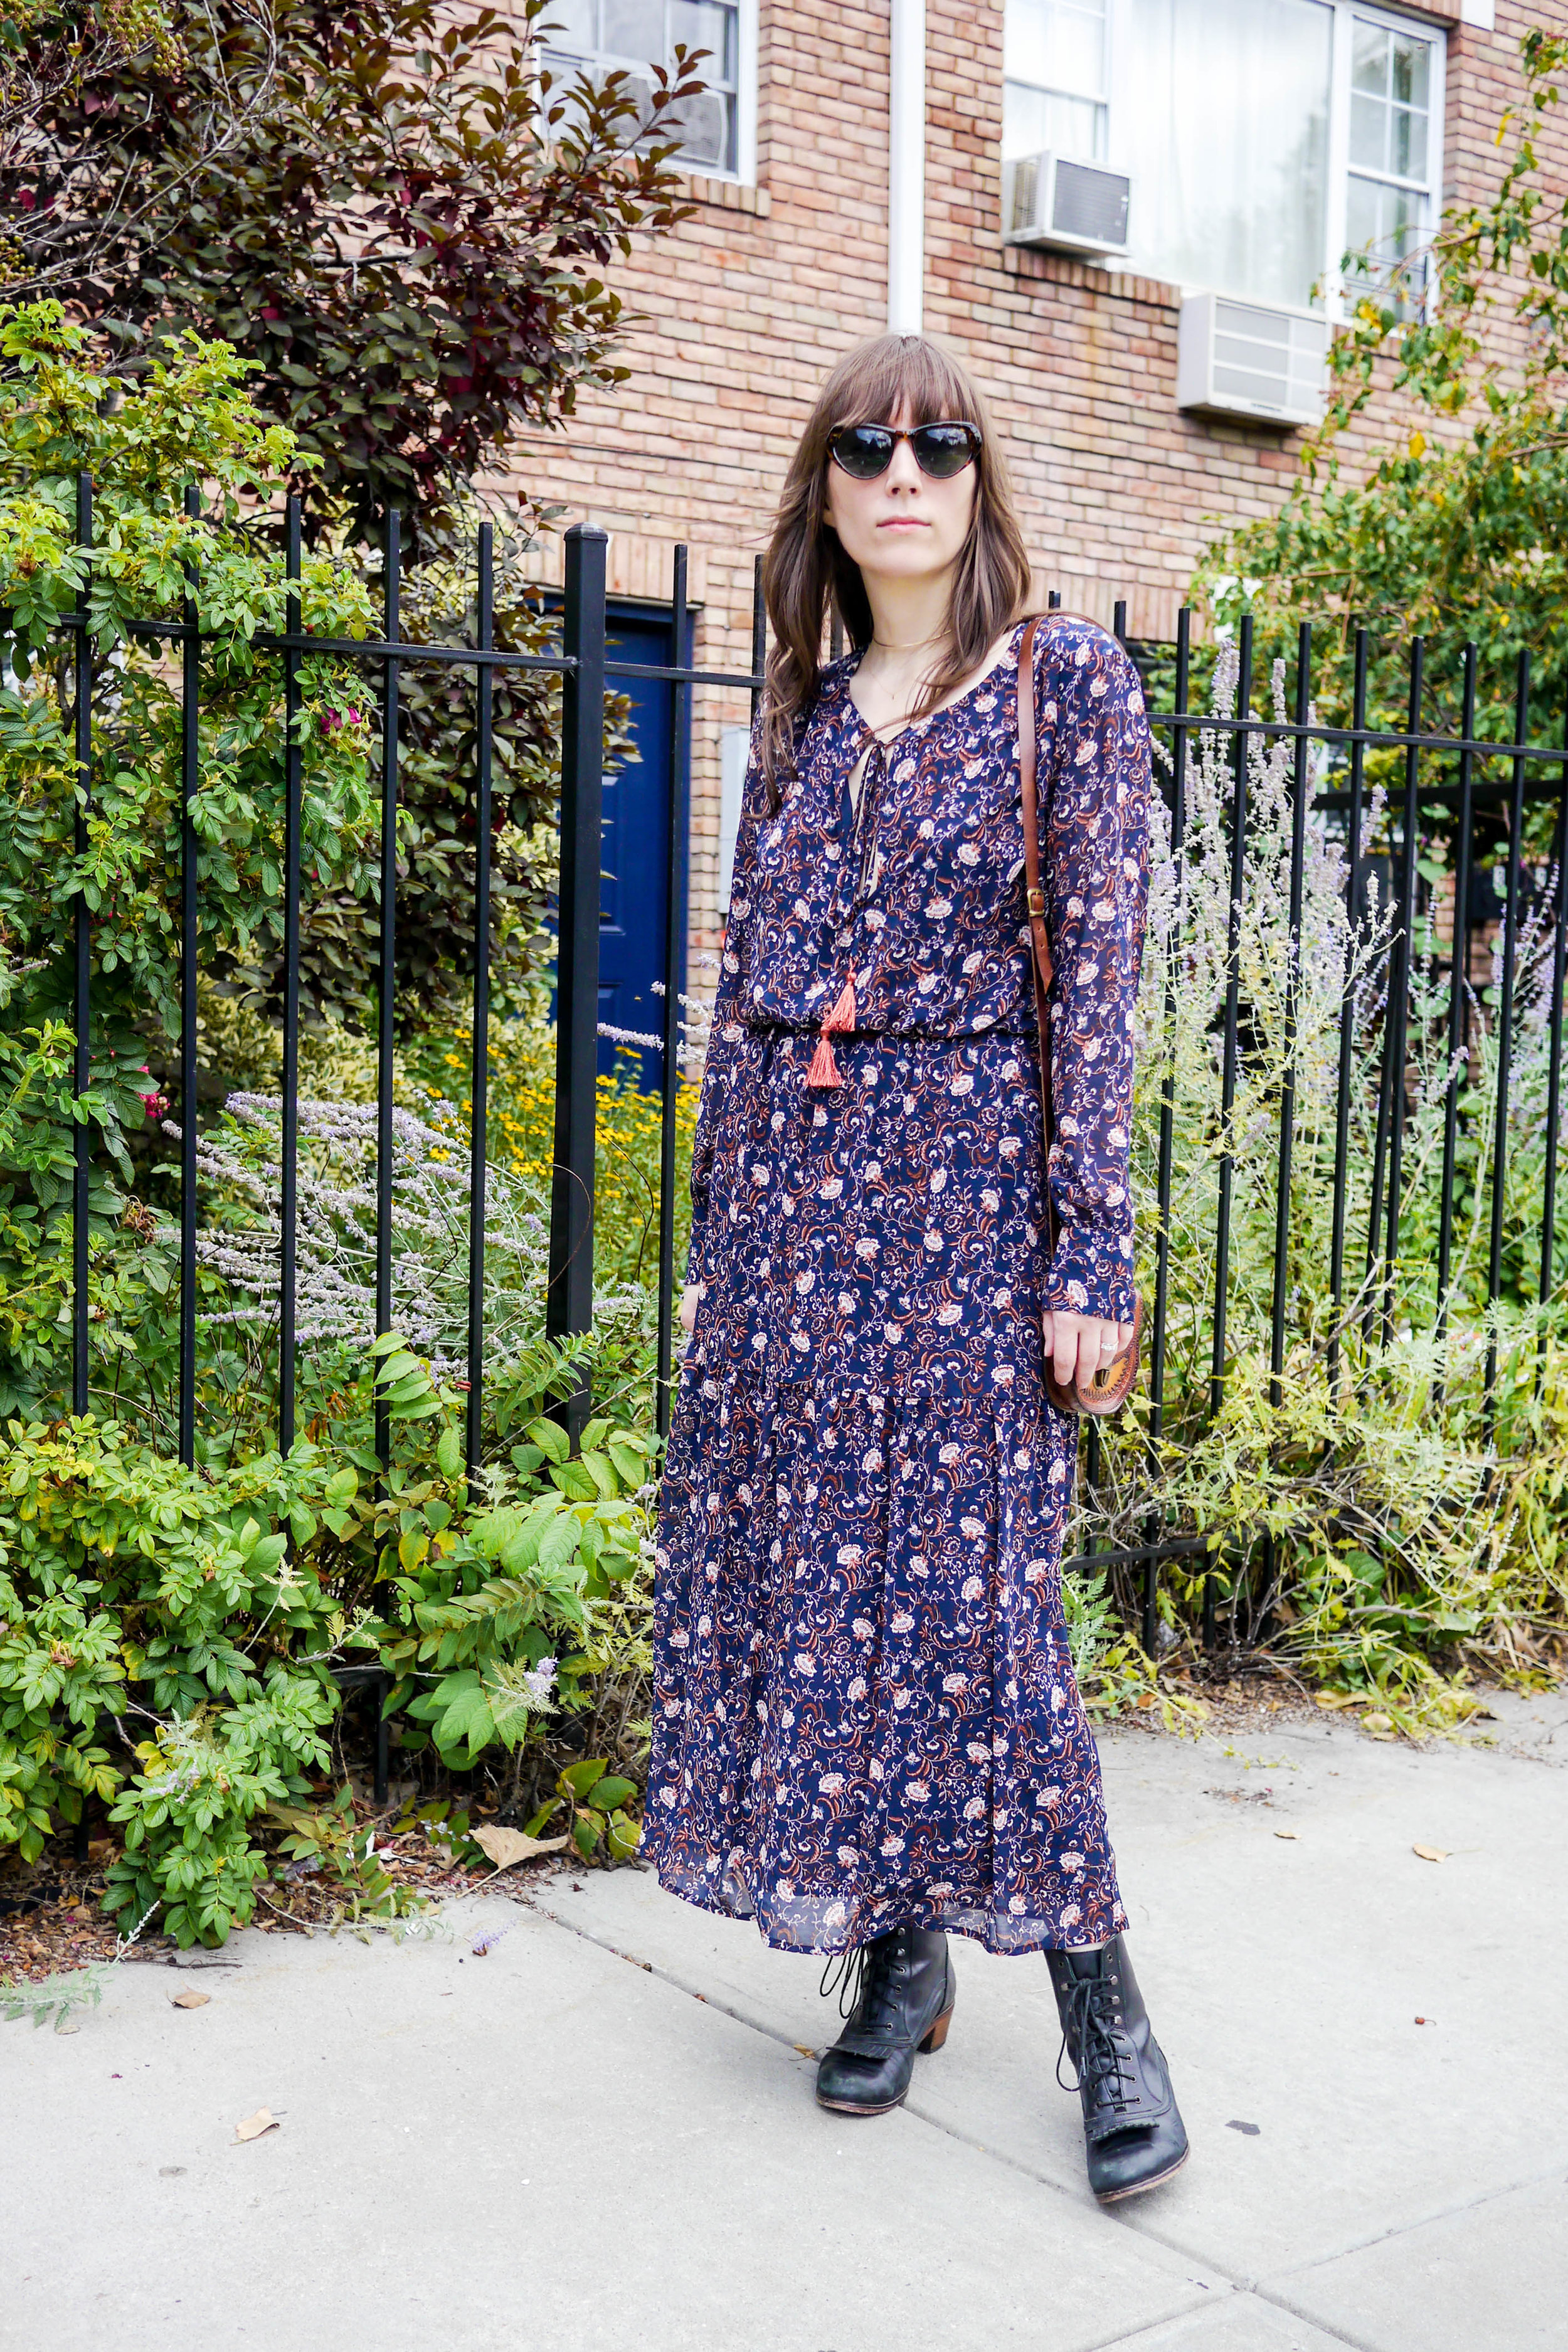 Dress, Wayf    ; Bag, Vintage ;    Boots, Samantha Pleet    ;    Sunglasses, Spitfire